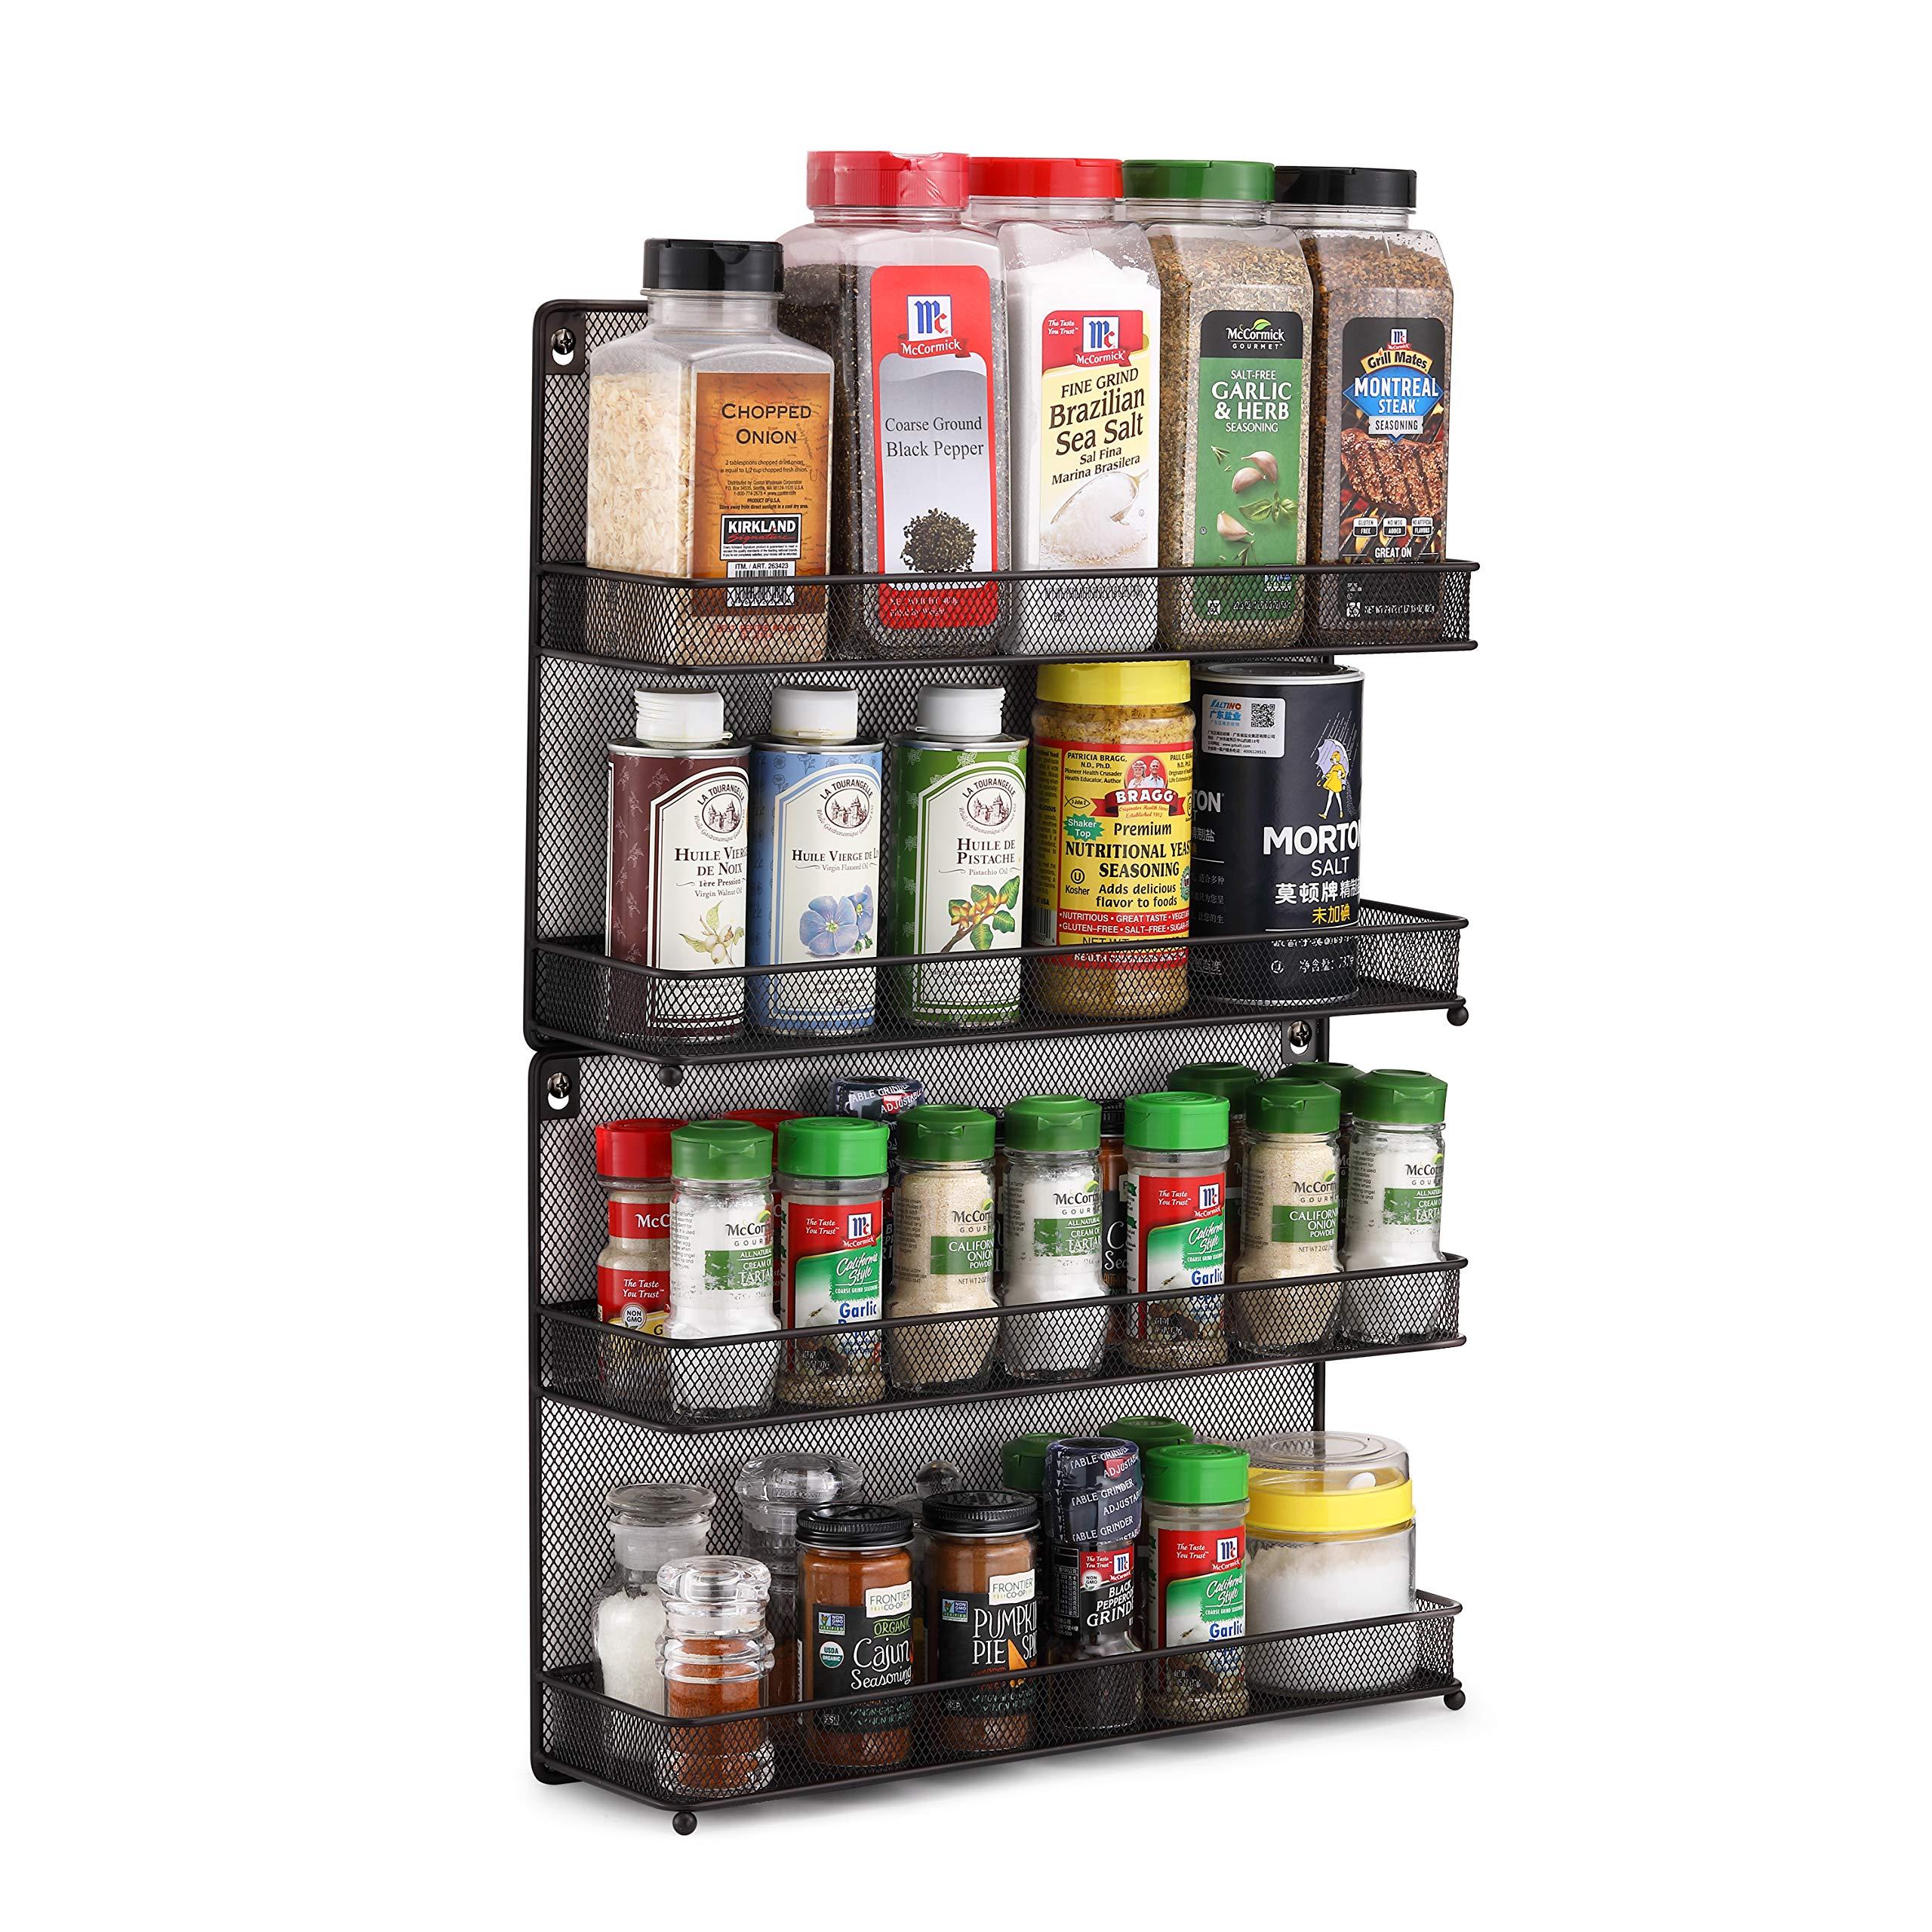 CAXXA 2 PK 2 Tier Mesh Kitchen Counter-top or Wall Mount Spice Rack Jars Storage Organizer, Bronze by CAXXA